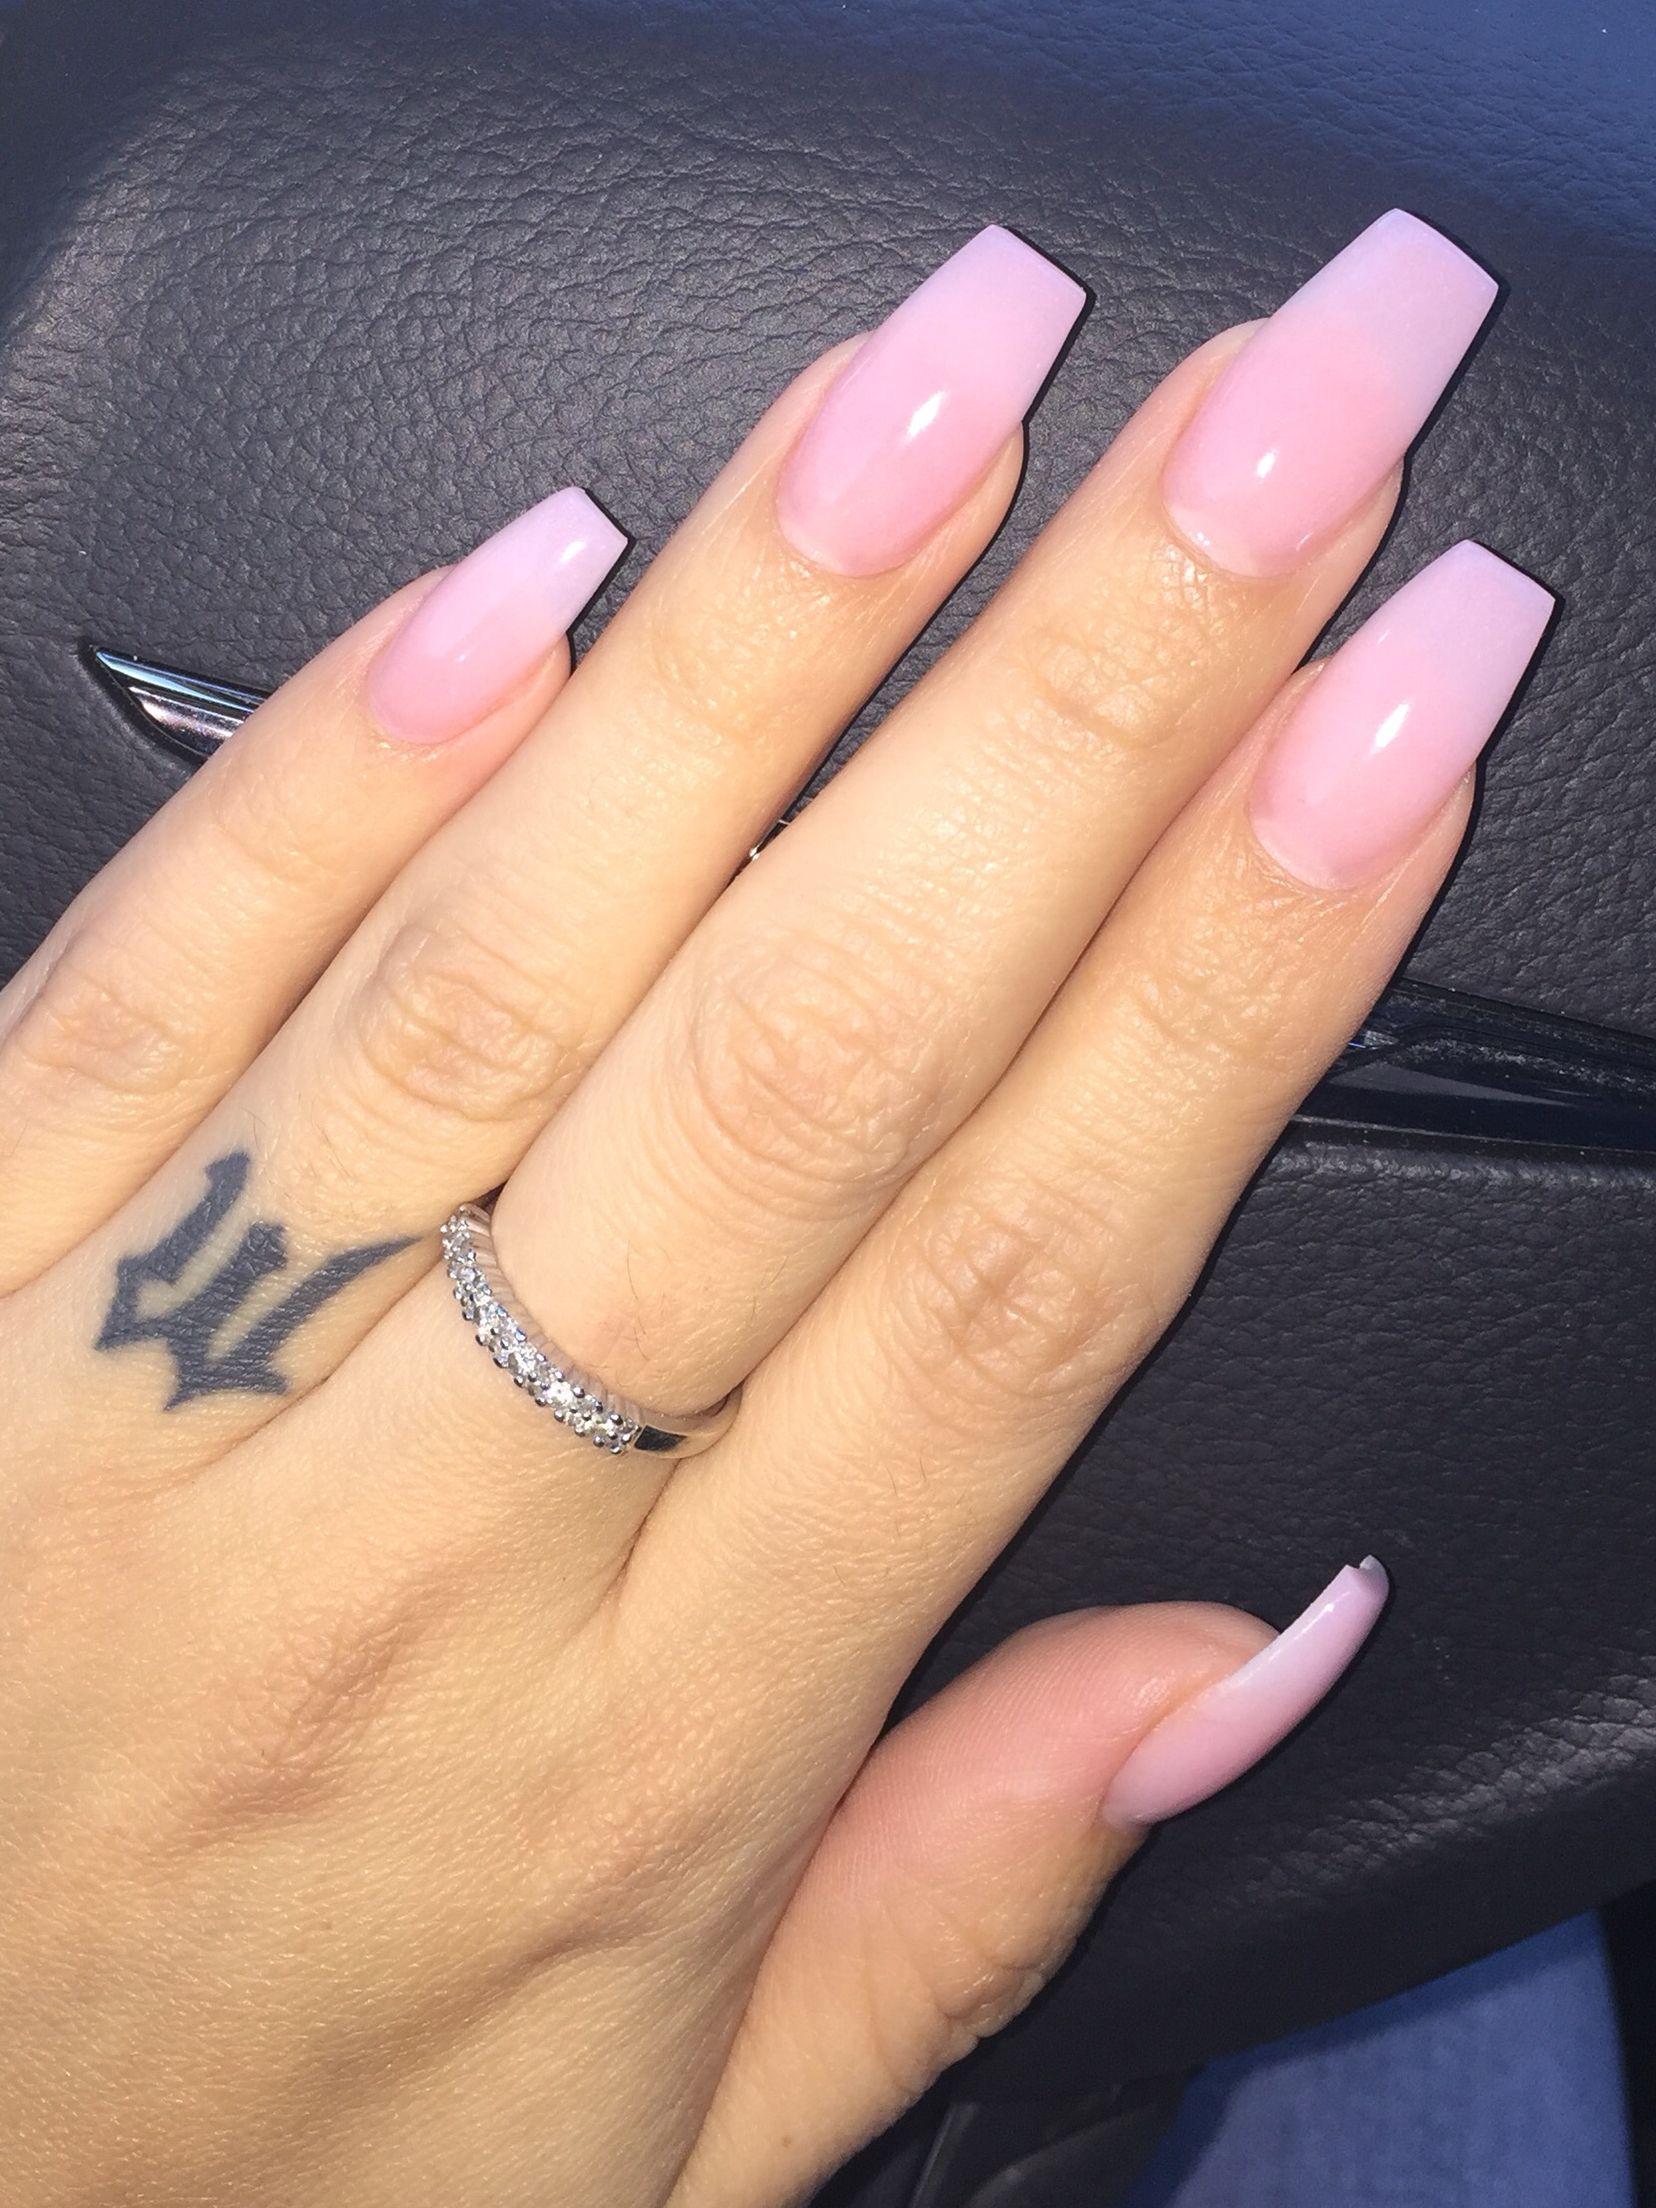 Pin by tiffany bryant on nail obsession pinterest nails nail